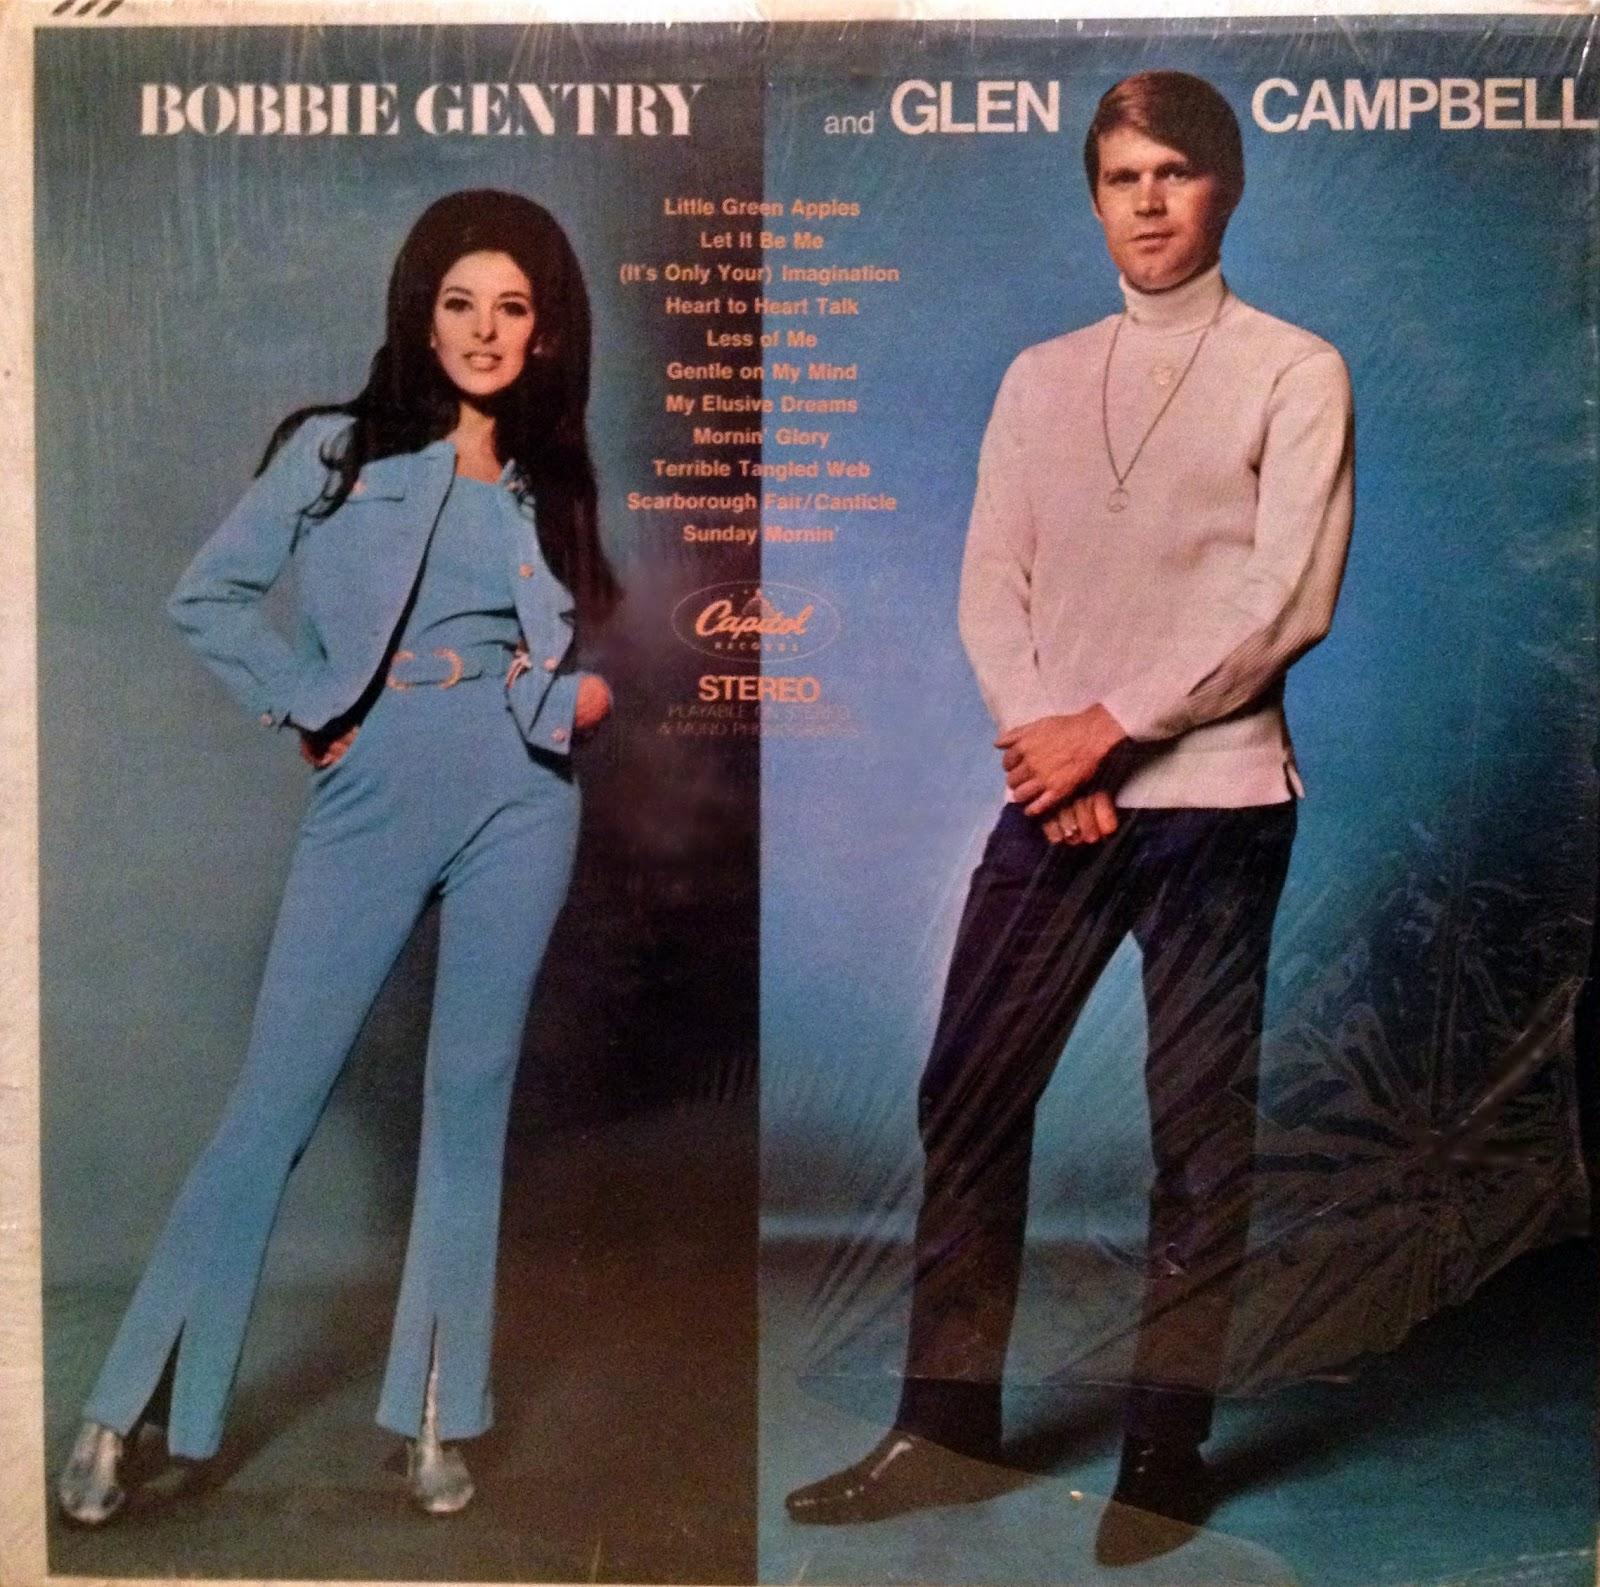 Vinyl Exam Bobbie Gentry Amp Glen Campbell Bobbie Gentry